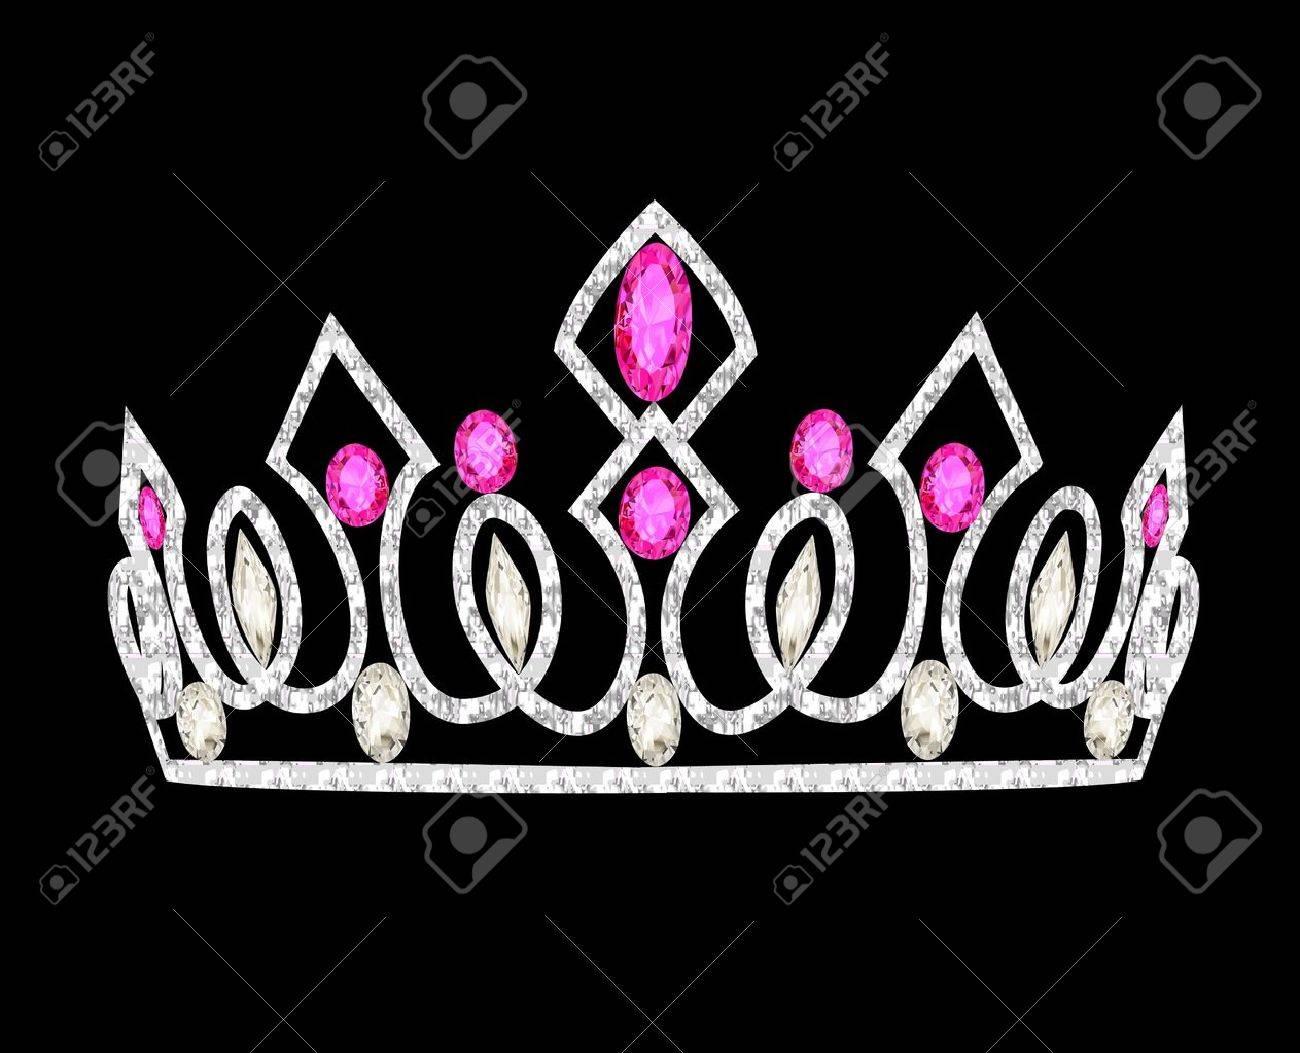 illustration tiara crown women's wedding with pink stones Stock Vector - 17309267